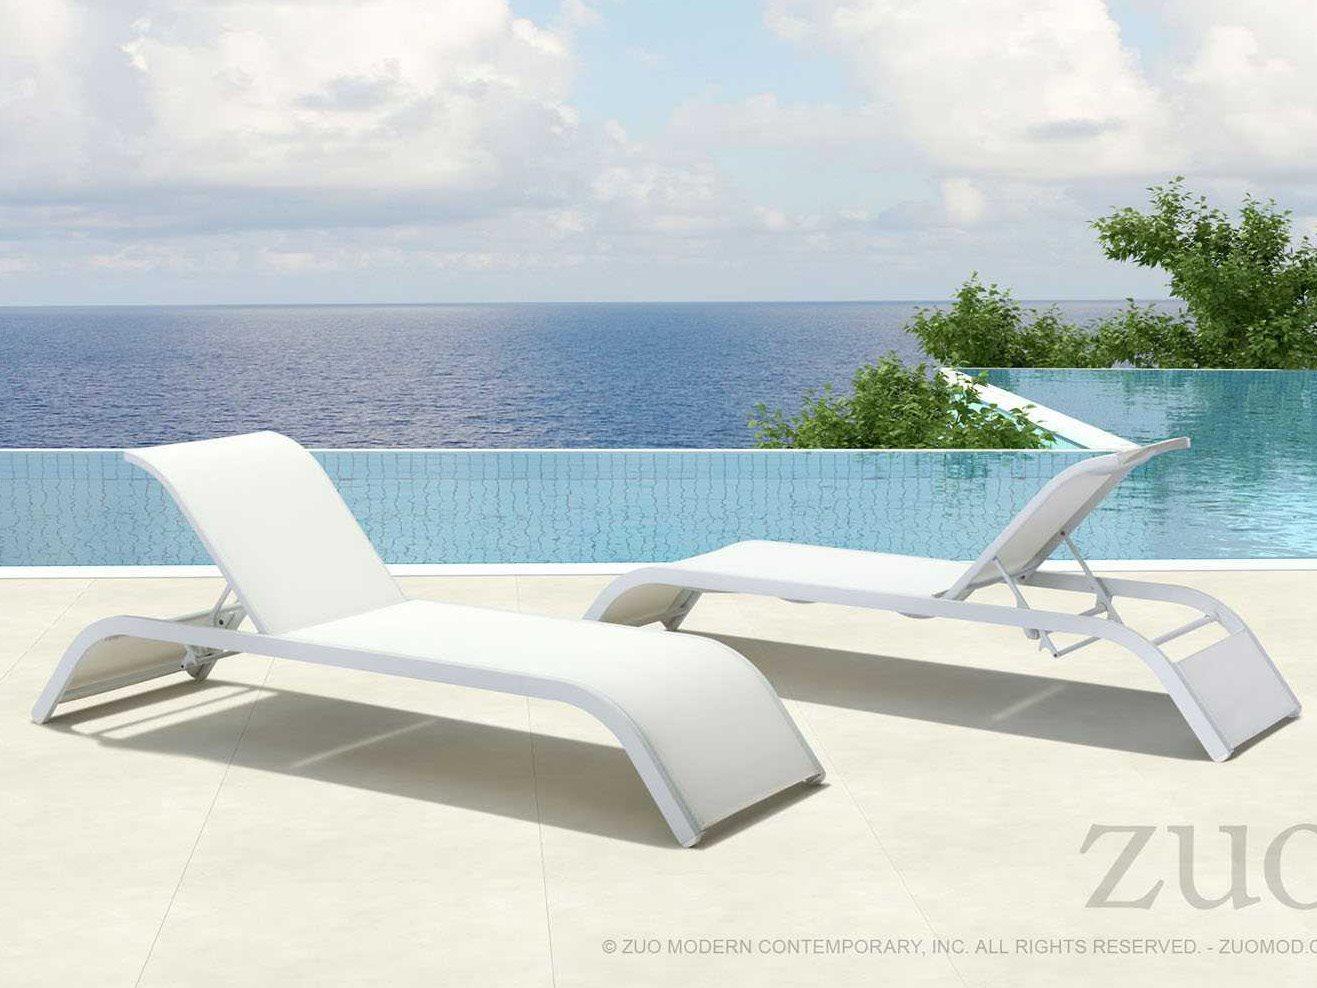 Zuo outdoor sun beach aluminum mesh chaise lounge set for Beach chaise lounges